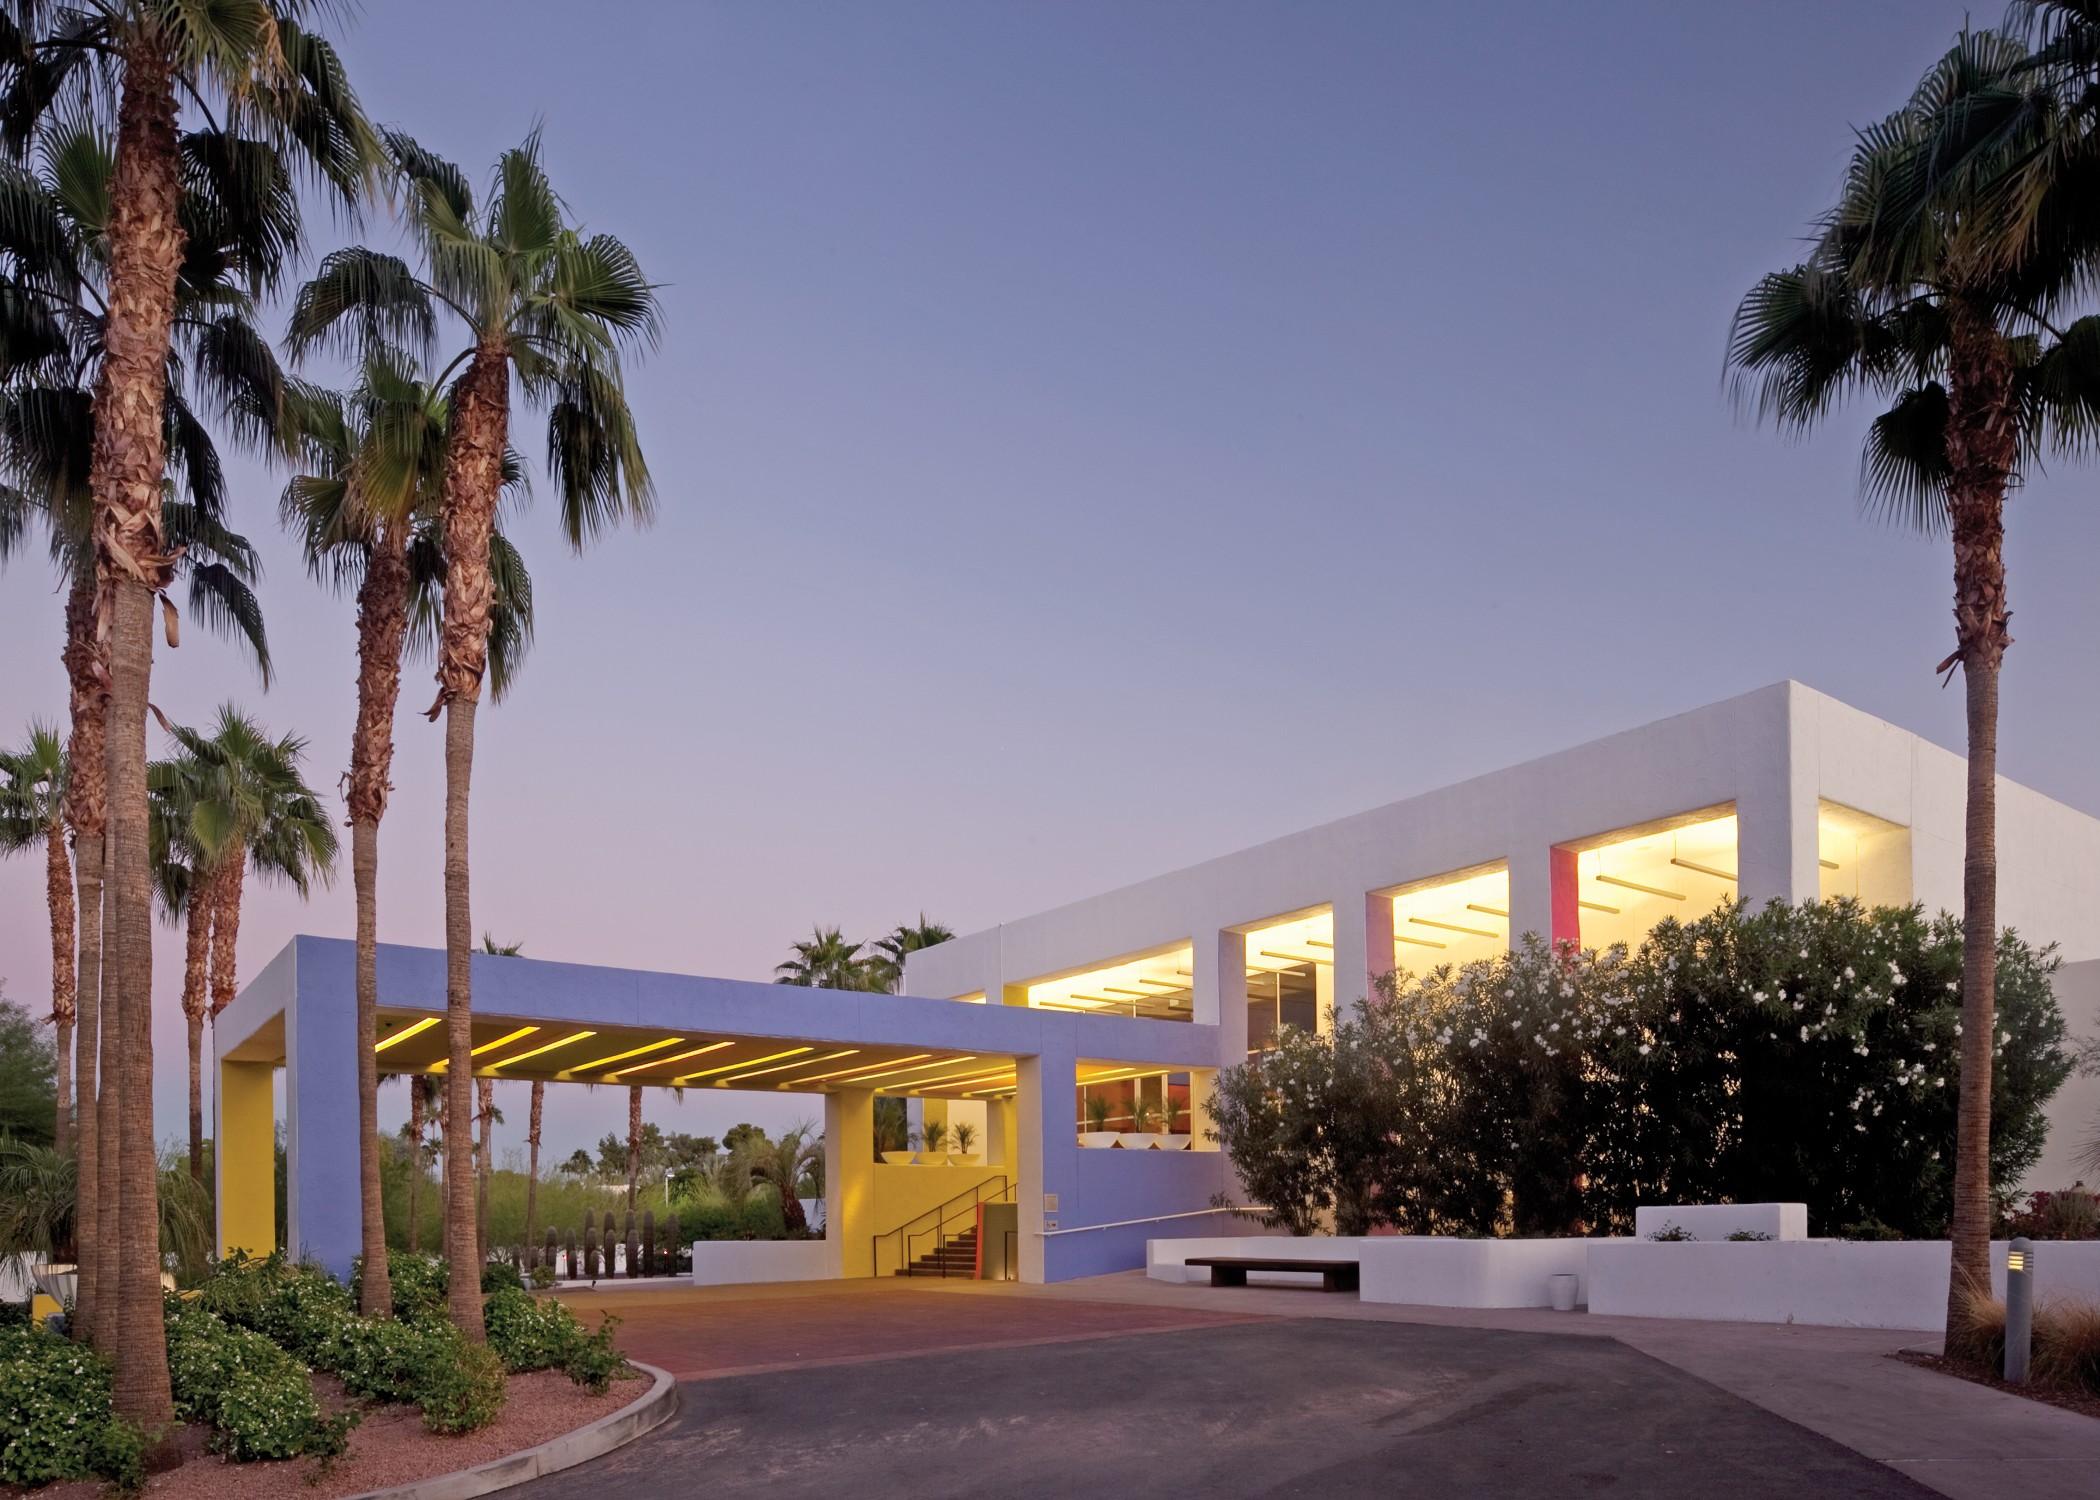 The Saguaro, Maricopa